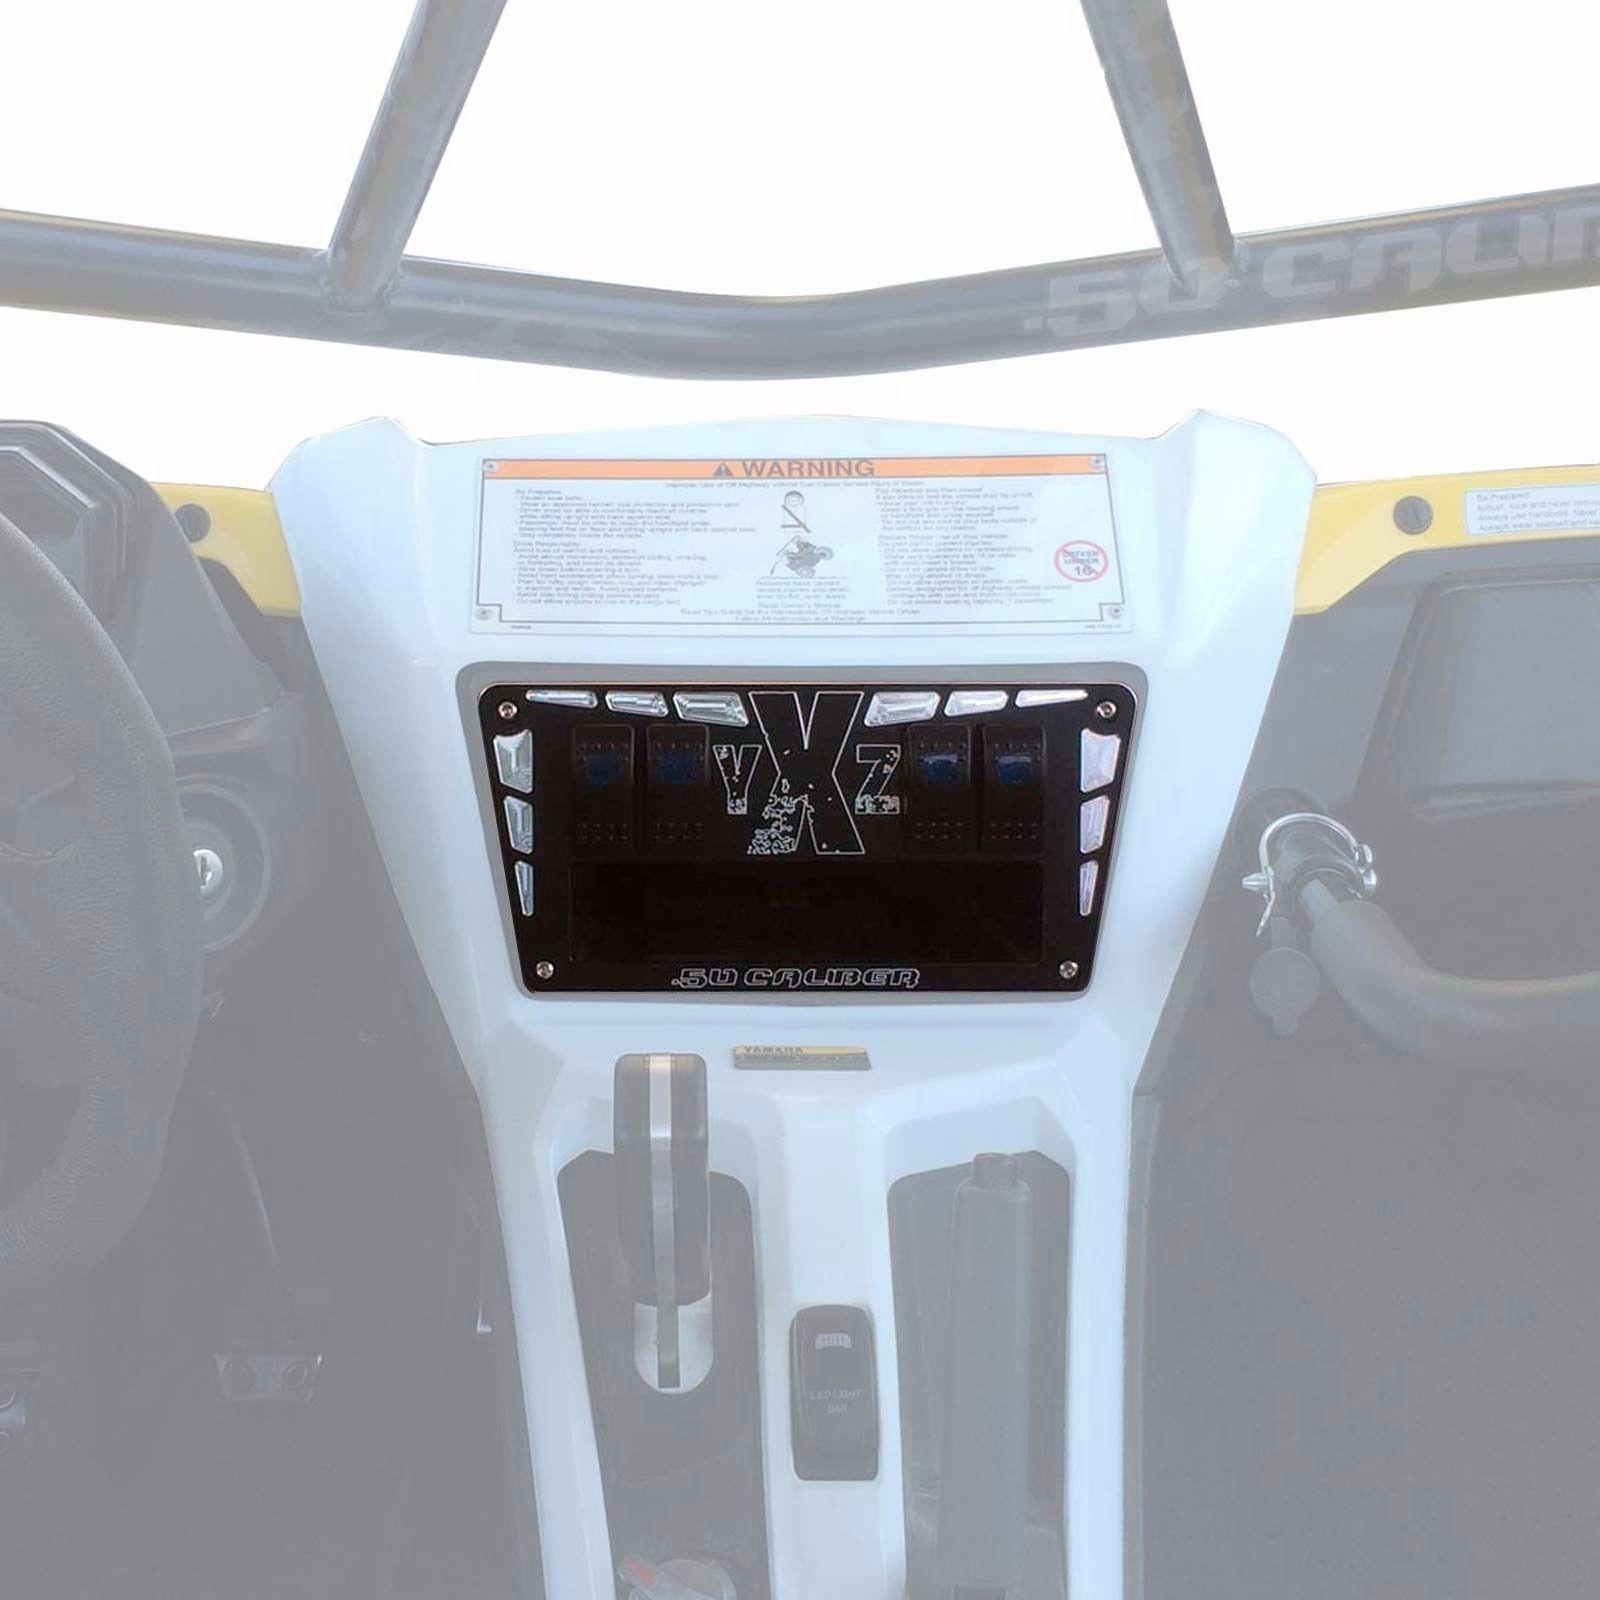 Outdoor Sports Yamaha YXZ 1000R black billet dash panel UTV